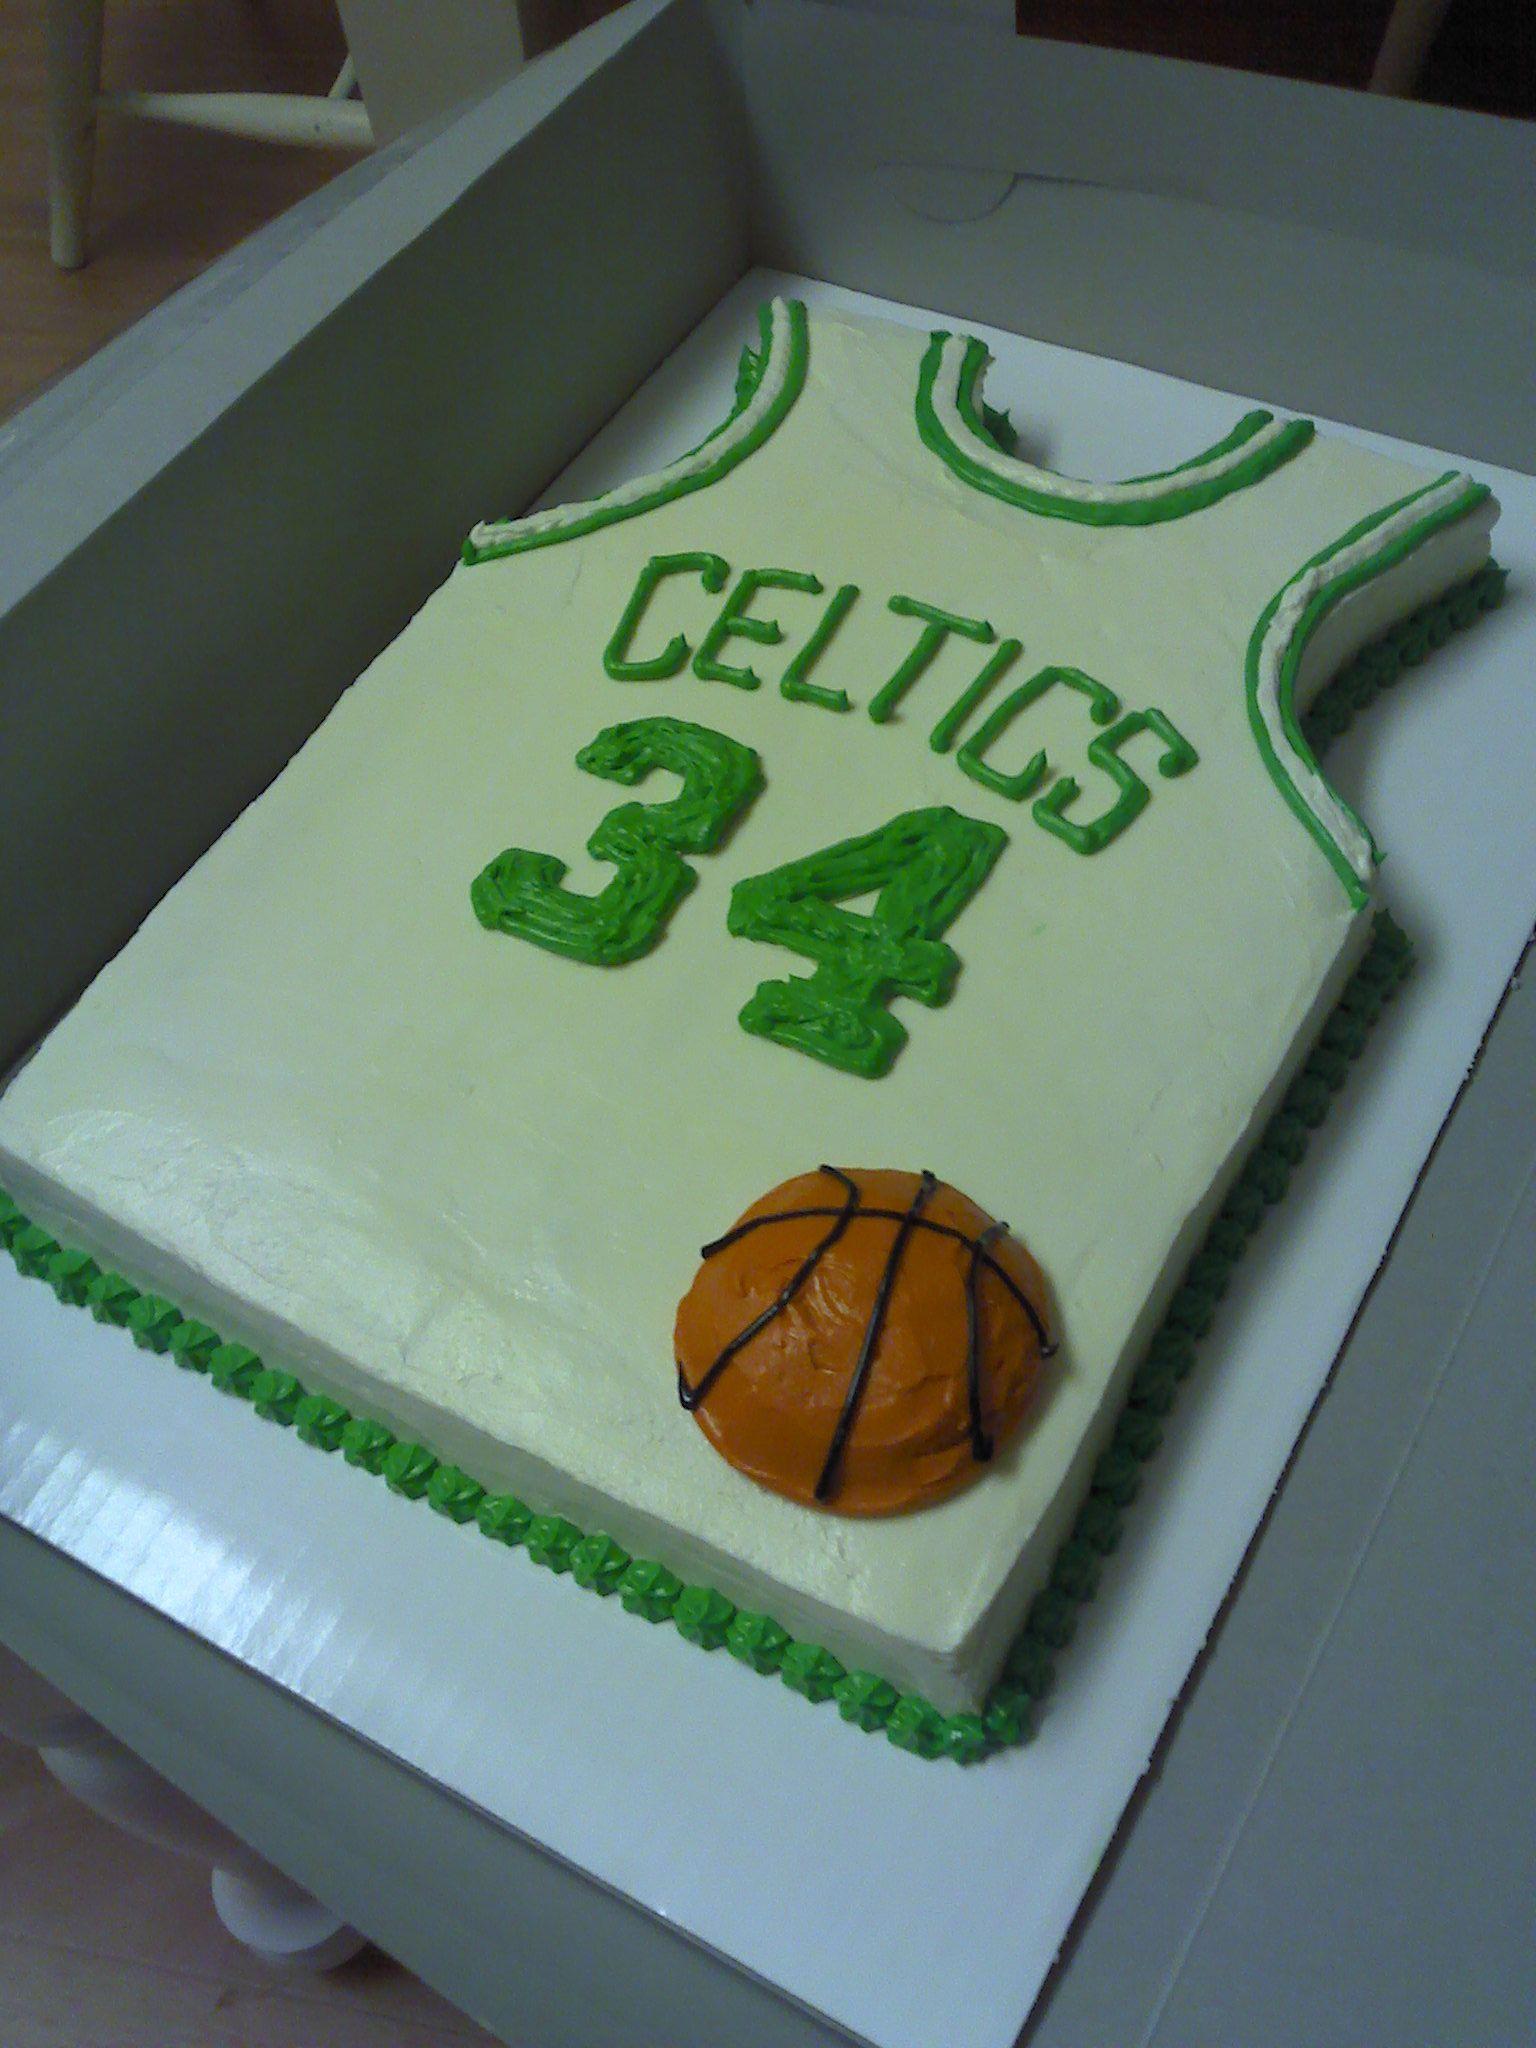 Celtics jersey cake winter cake birthday balloons